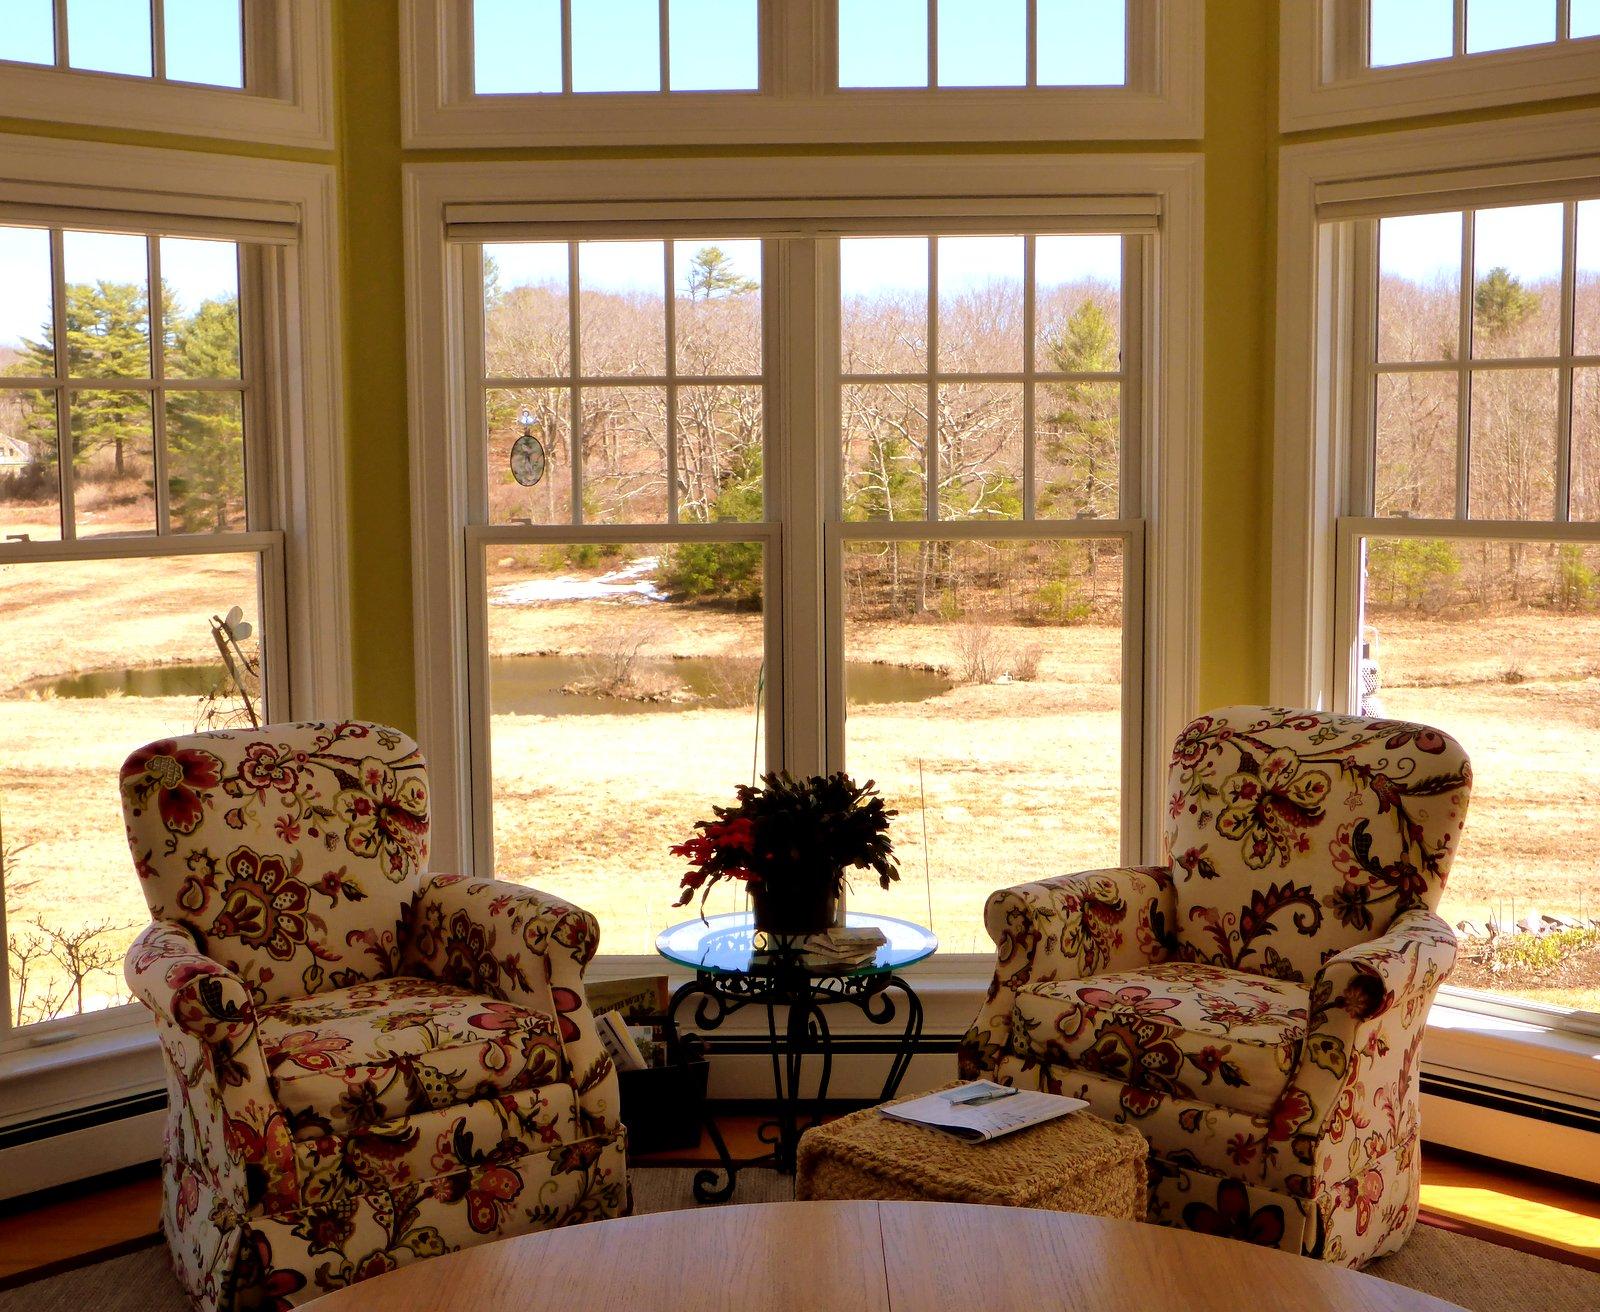 New Hampshire Interior Design - P1030046 - Panache Interior Design